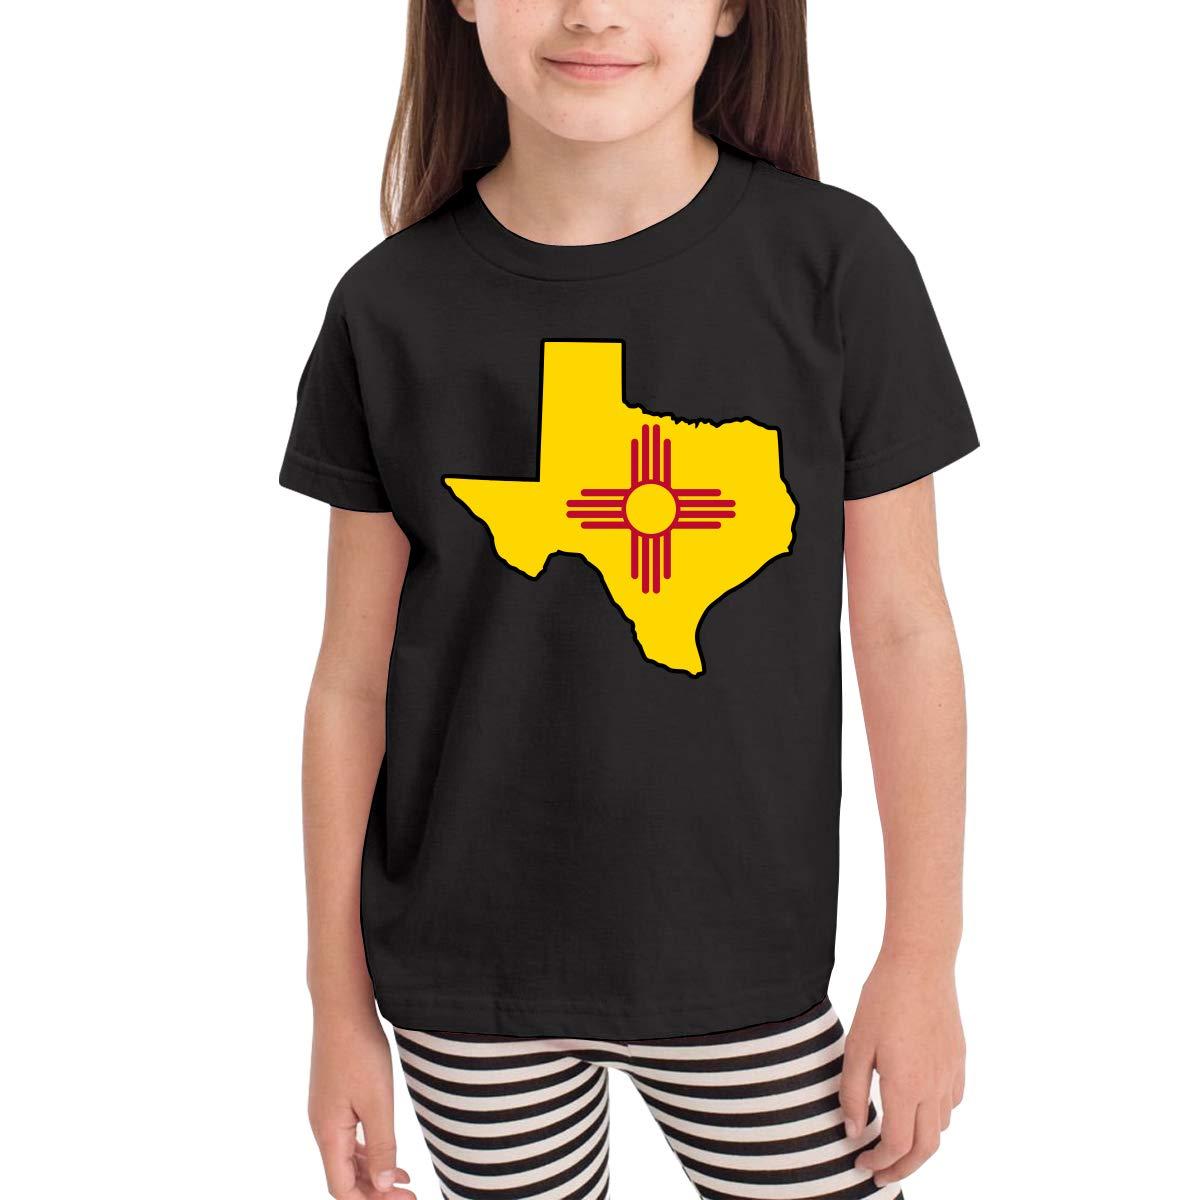 CERTONGCXTS Little Girls Texas New Mexico Flag Cotton Short Sleeve Tee Shirt Size 2-6